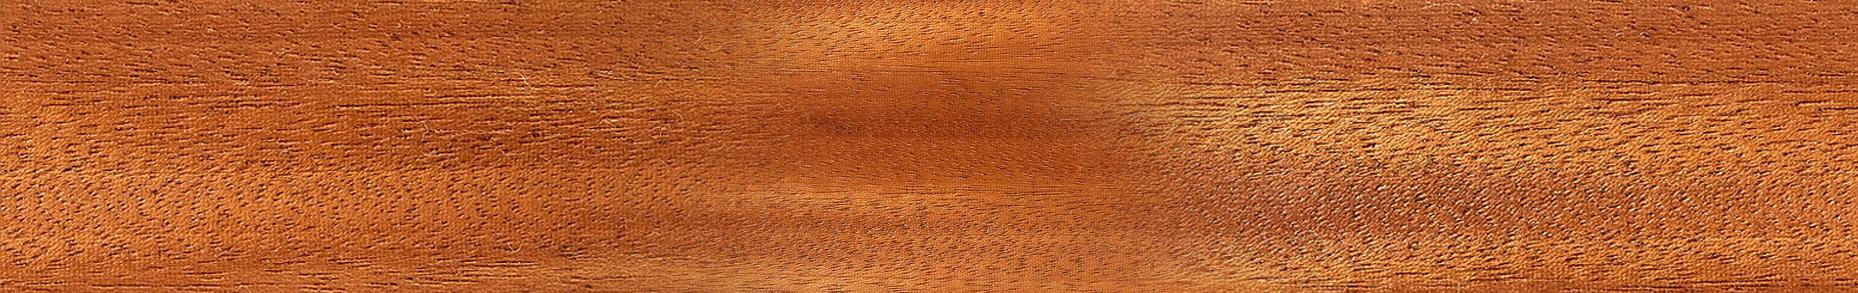 Lattenrost Holz Hintergrund Slider